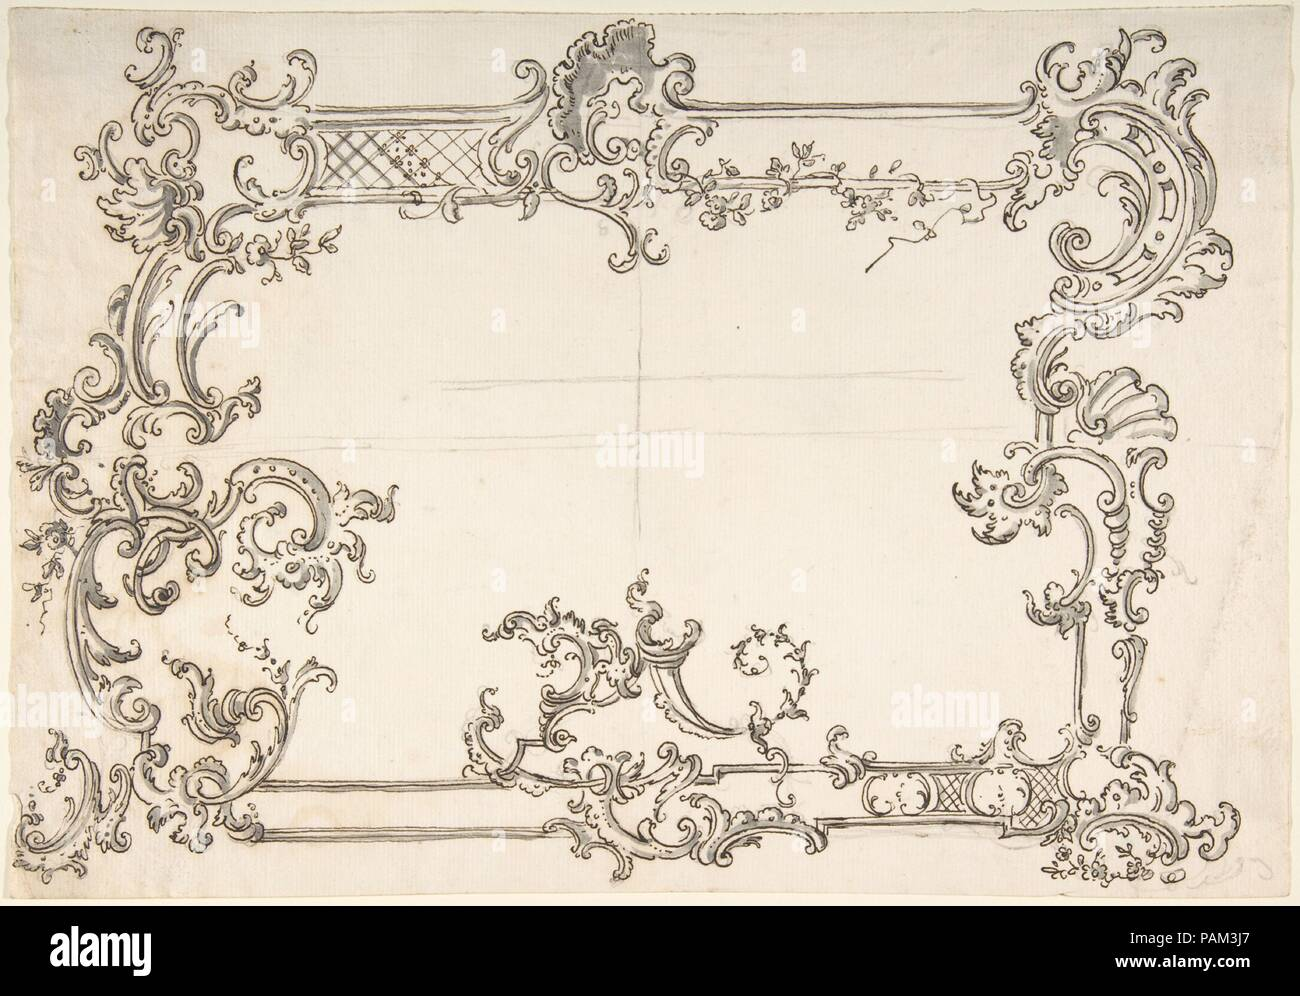 Rococo Design For A Frame Artist Anonymous Italian 18th Century